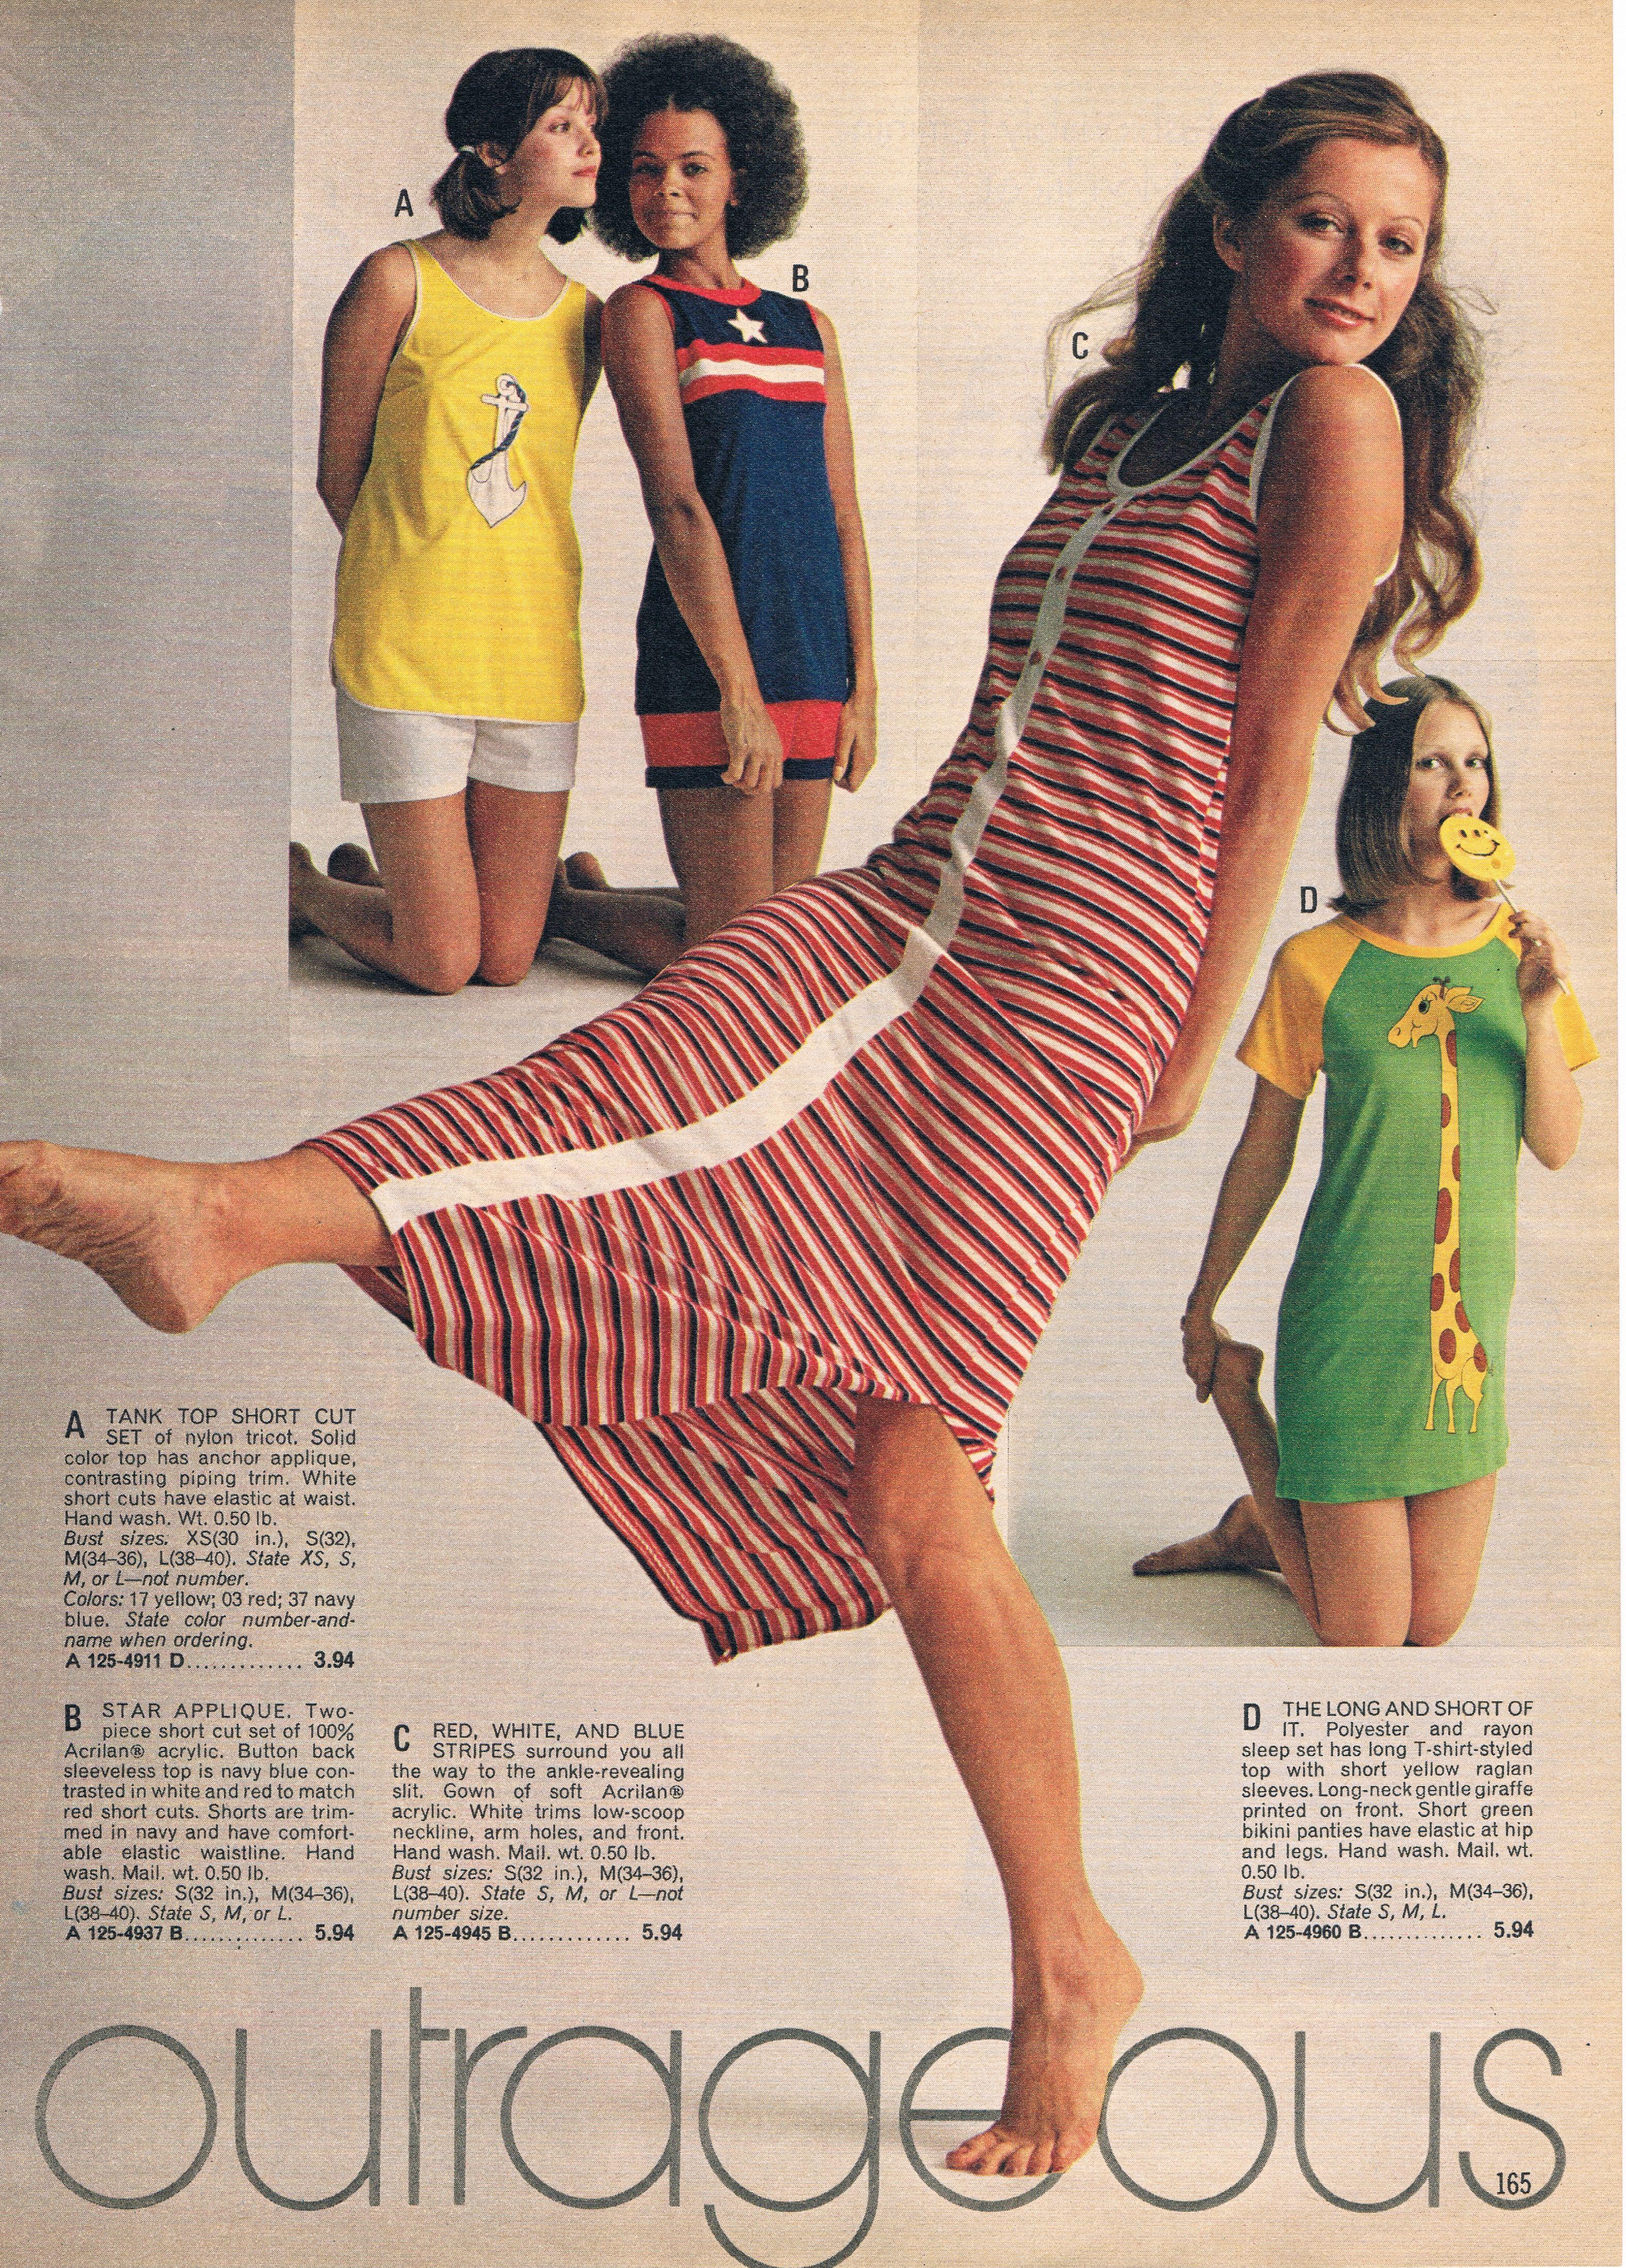 Penneys catalog s fashion part one pinterest s